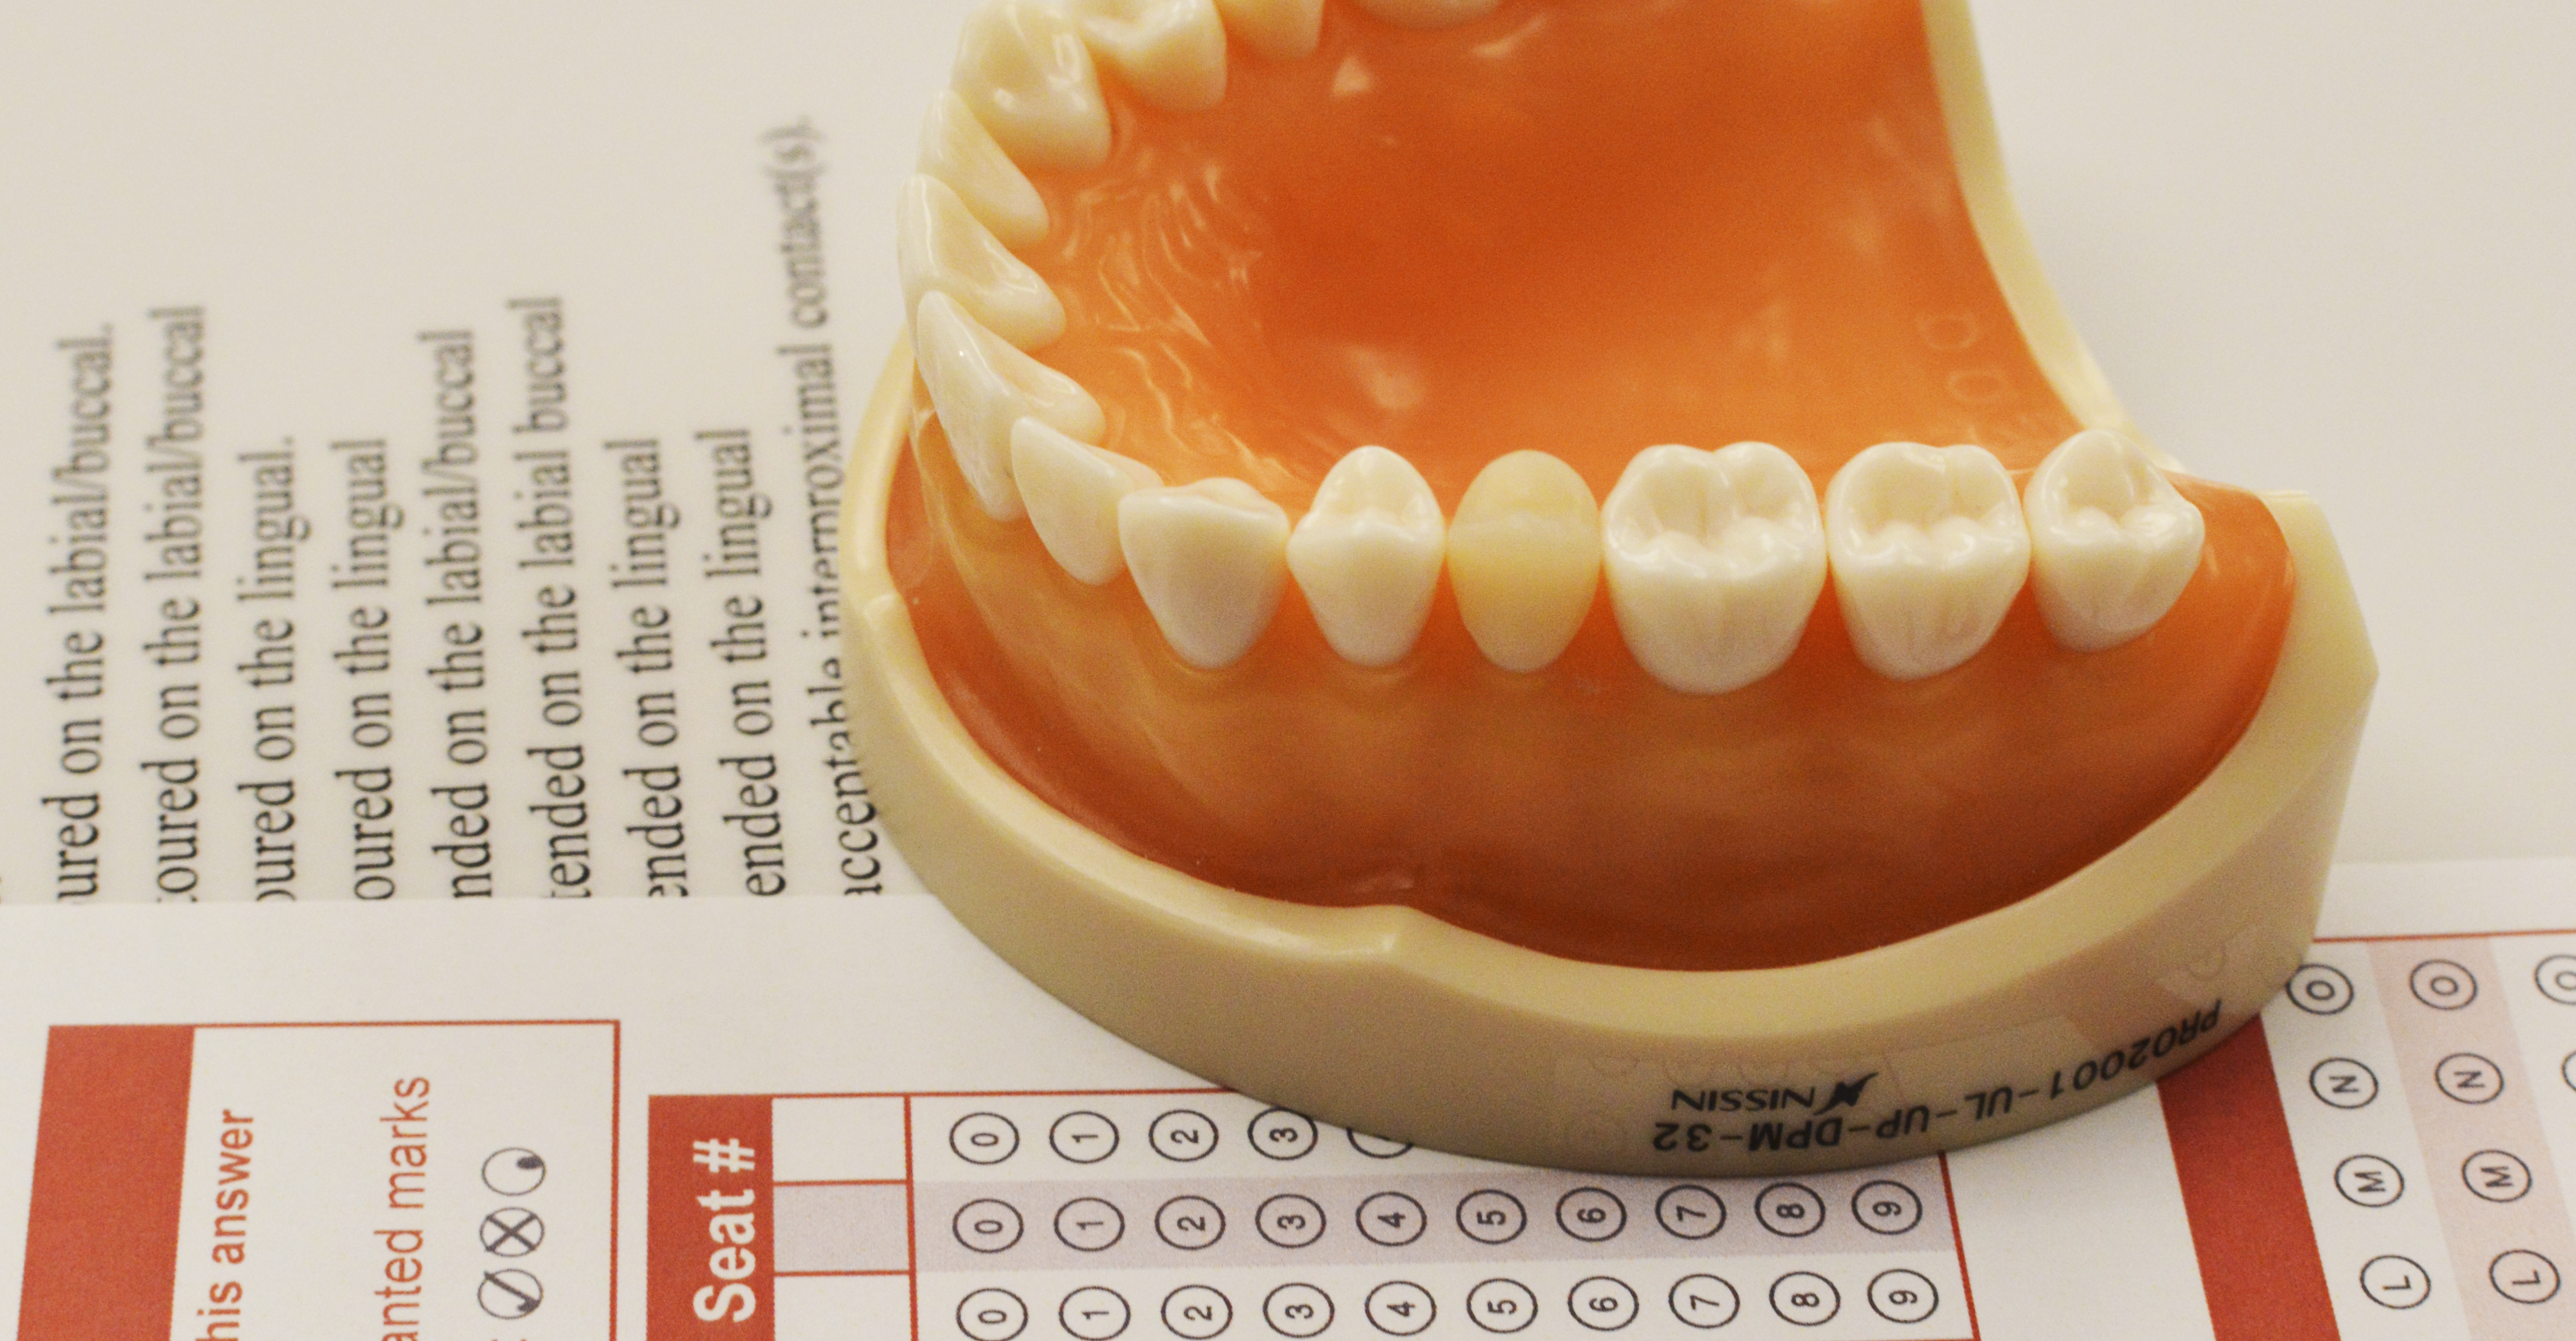 Example of NDEB dental equivalency OSCE exam